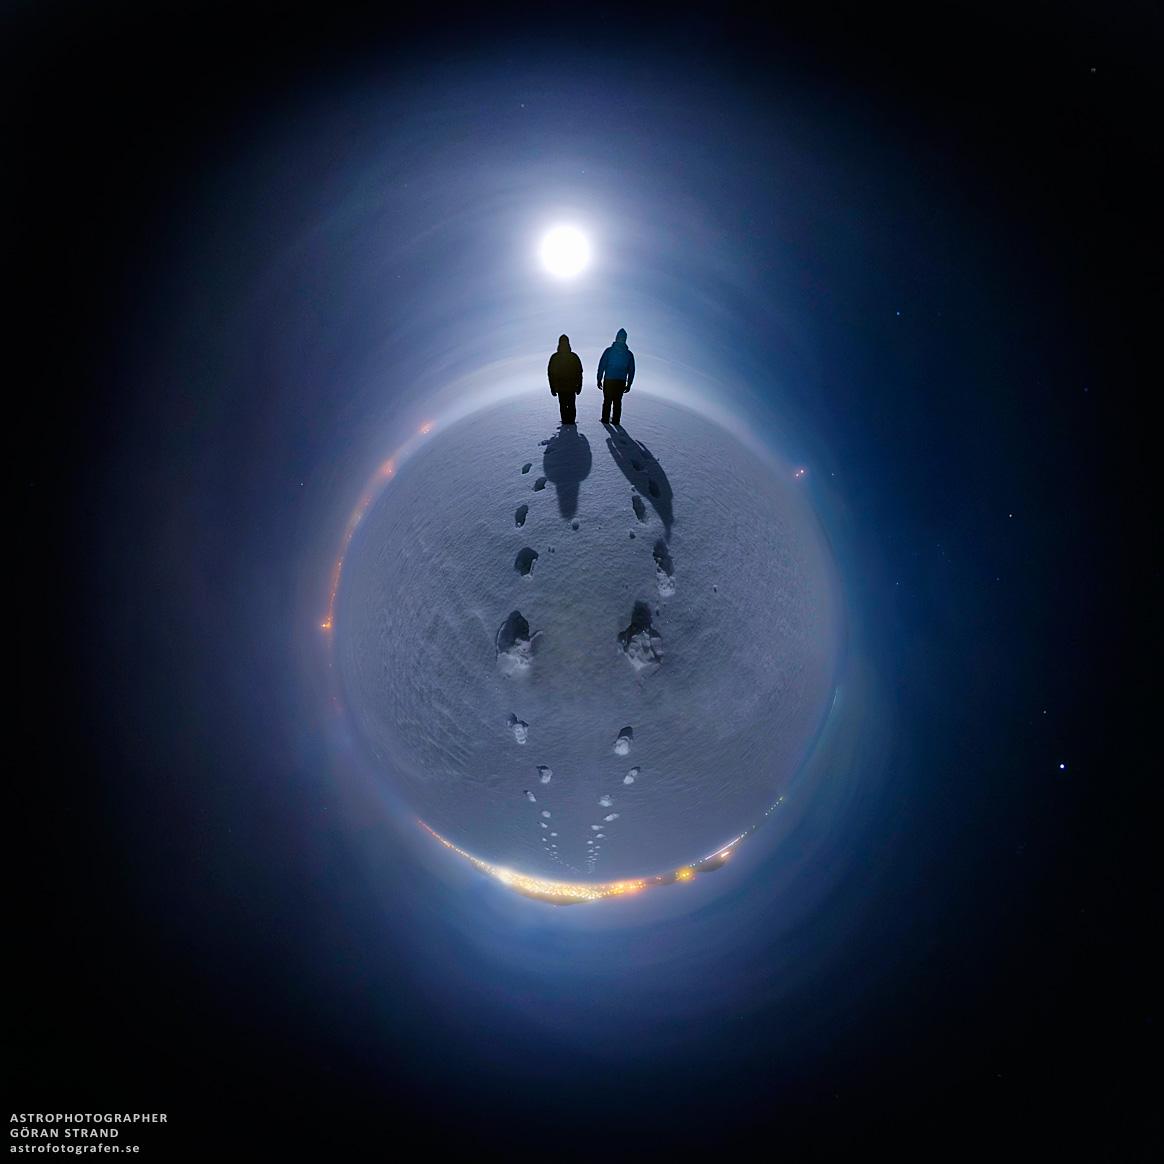 Small Snowy World